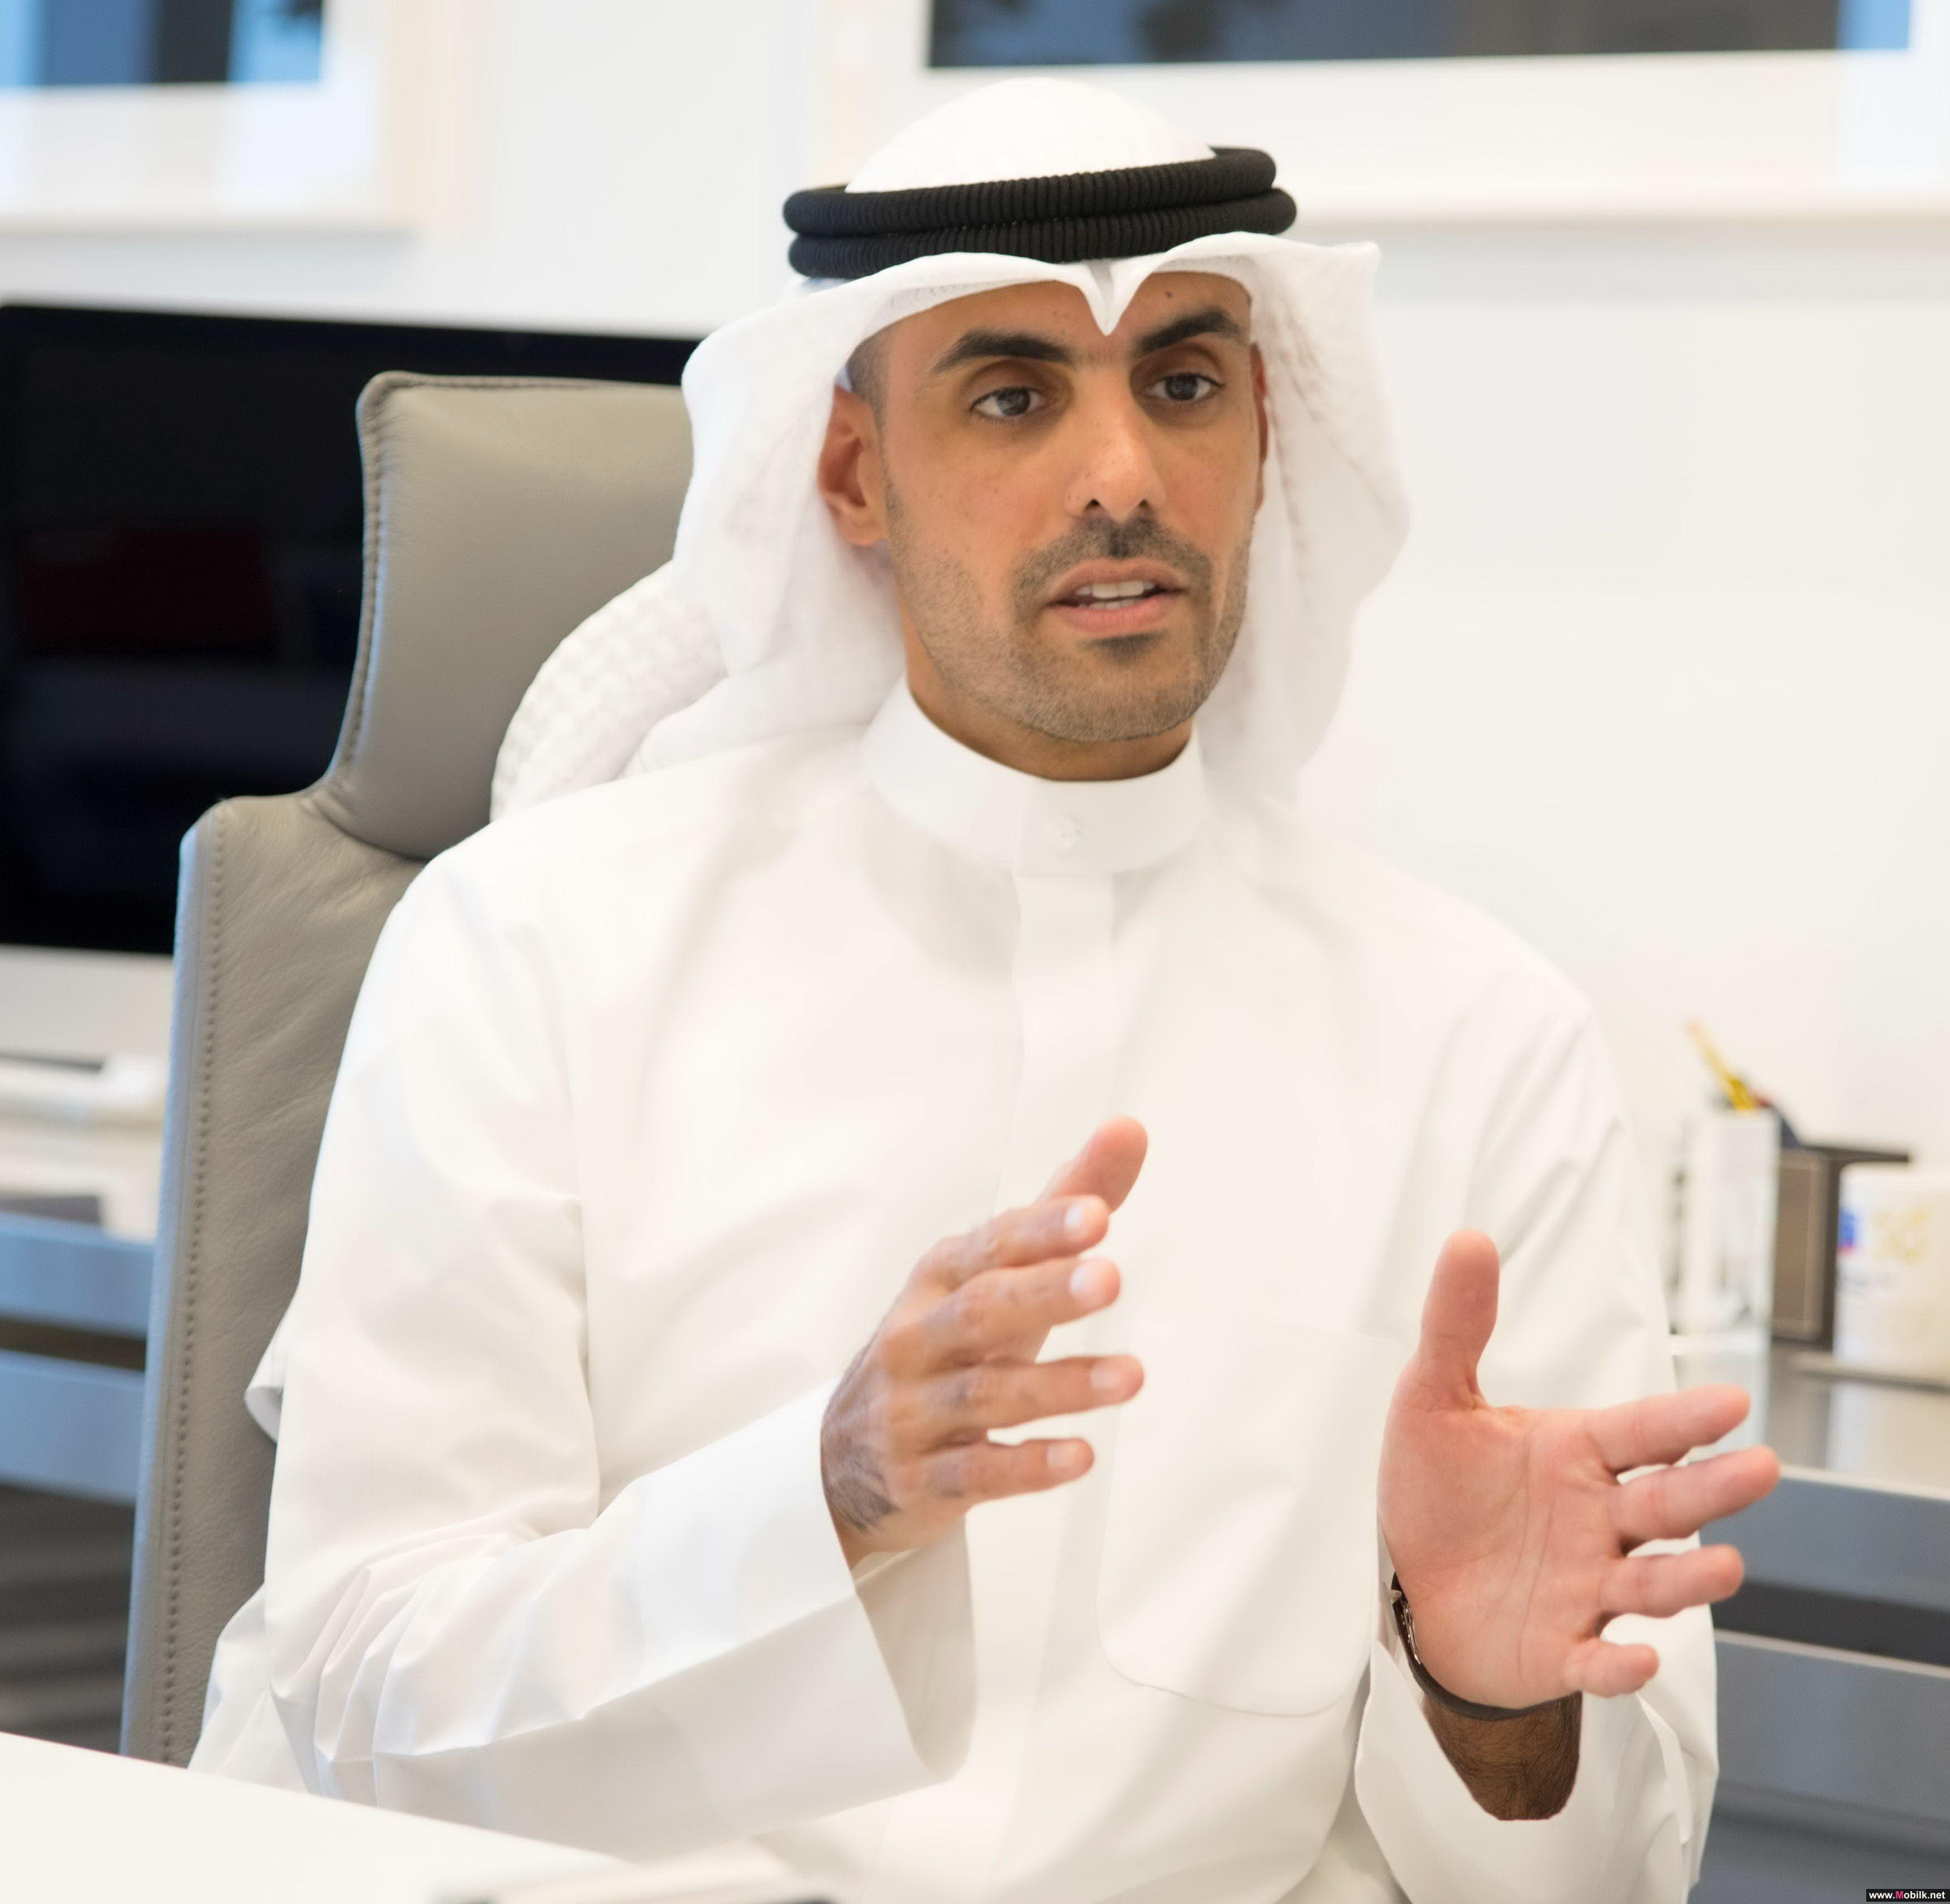 Zain Saudi Arabia reports first ever full-year net profit for 2017